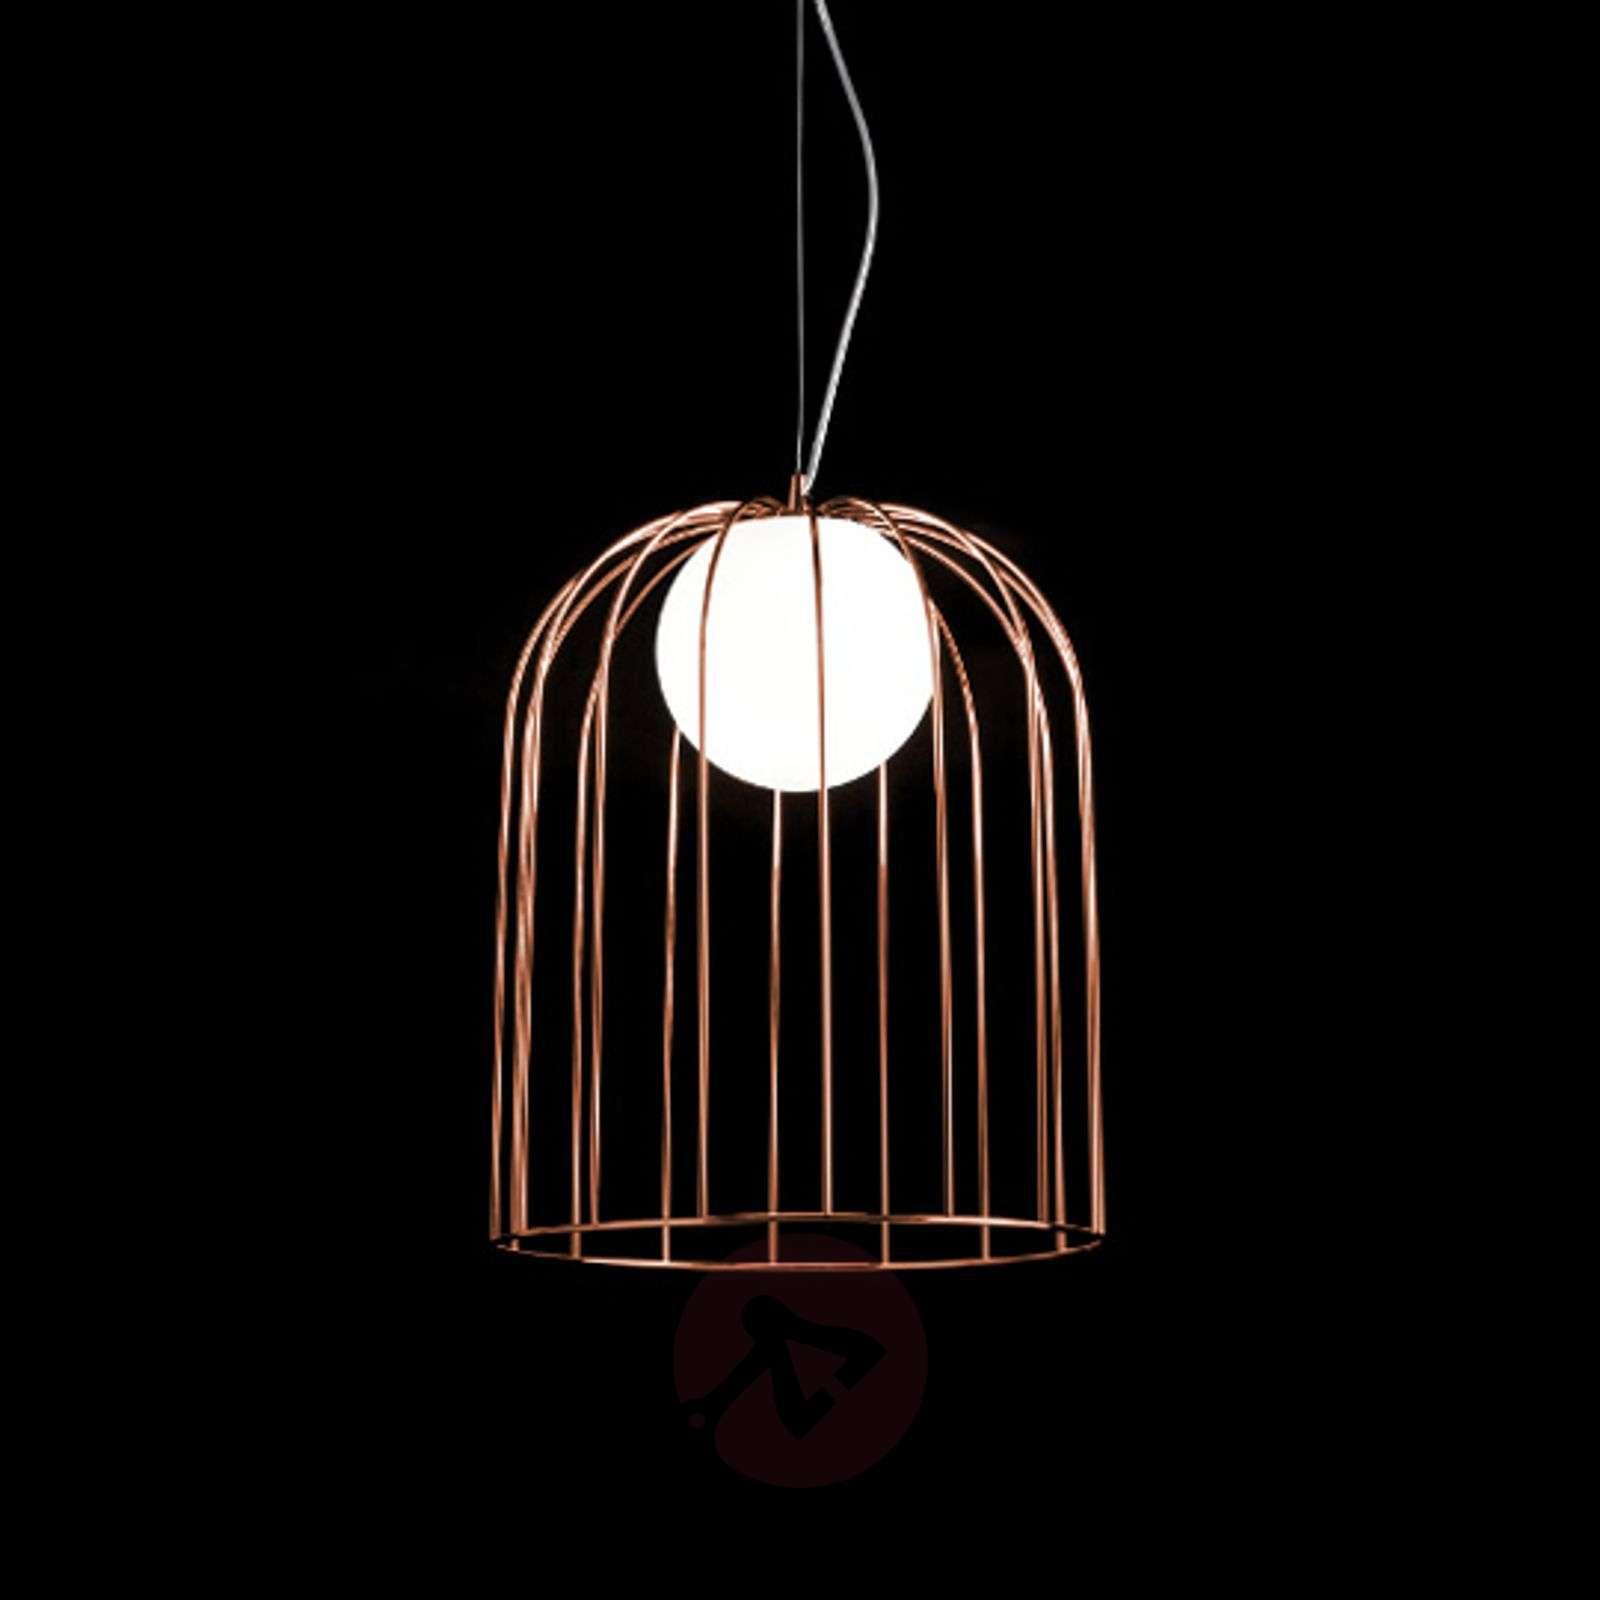 Copper lampshade designer pendant lamp kluvi lights copper lampshade designer pendant lamp kluvi 8525774 01 aloadofball Choice Image